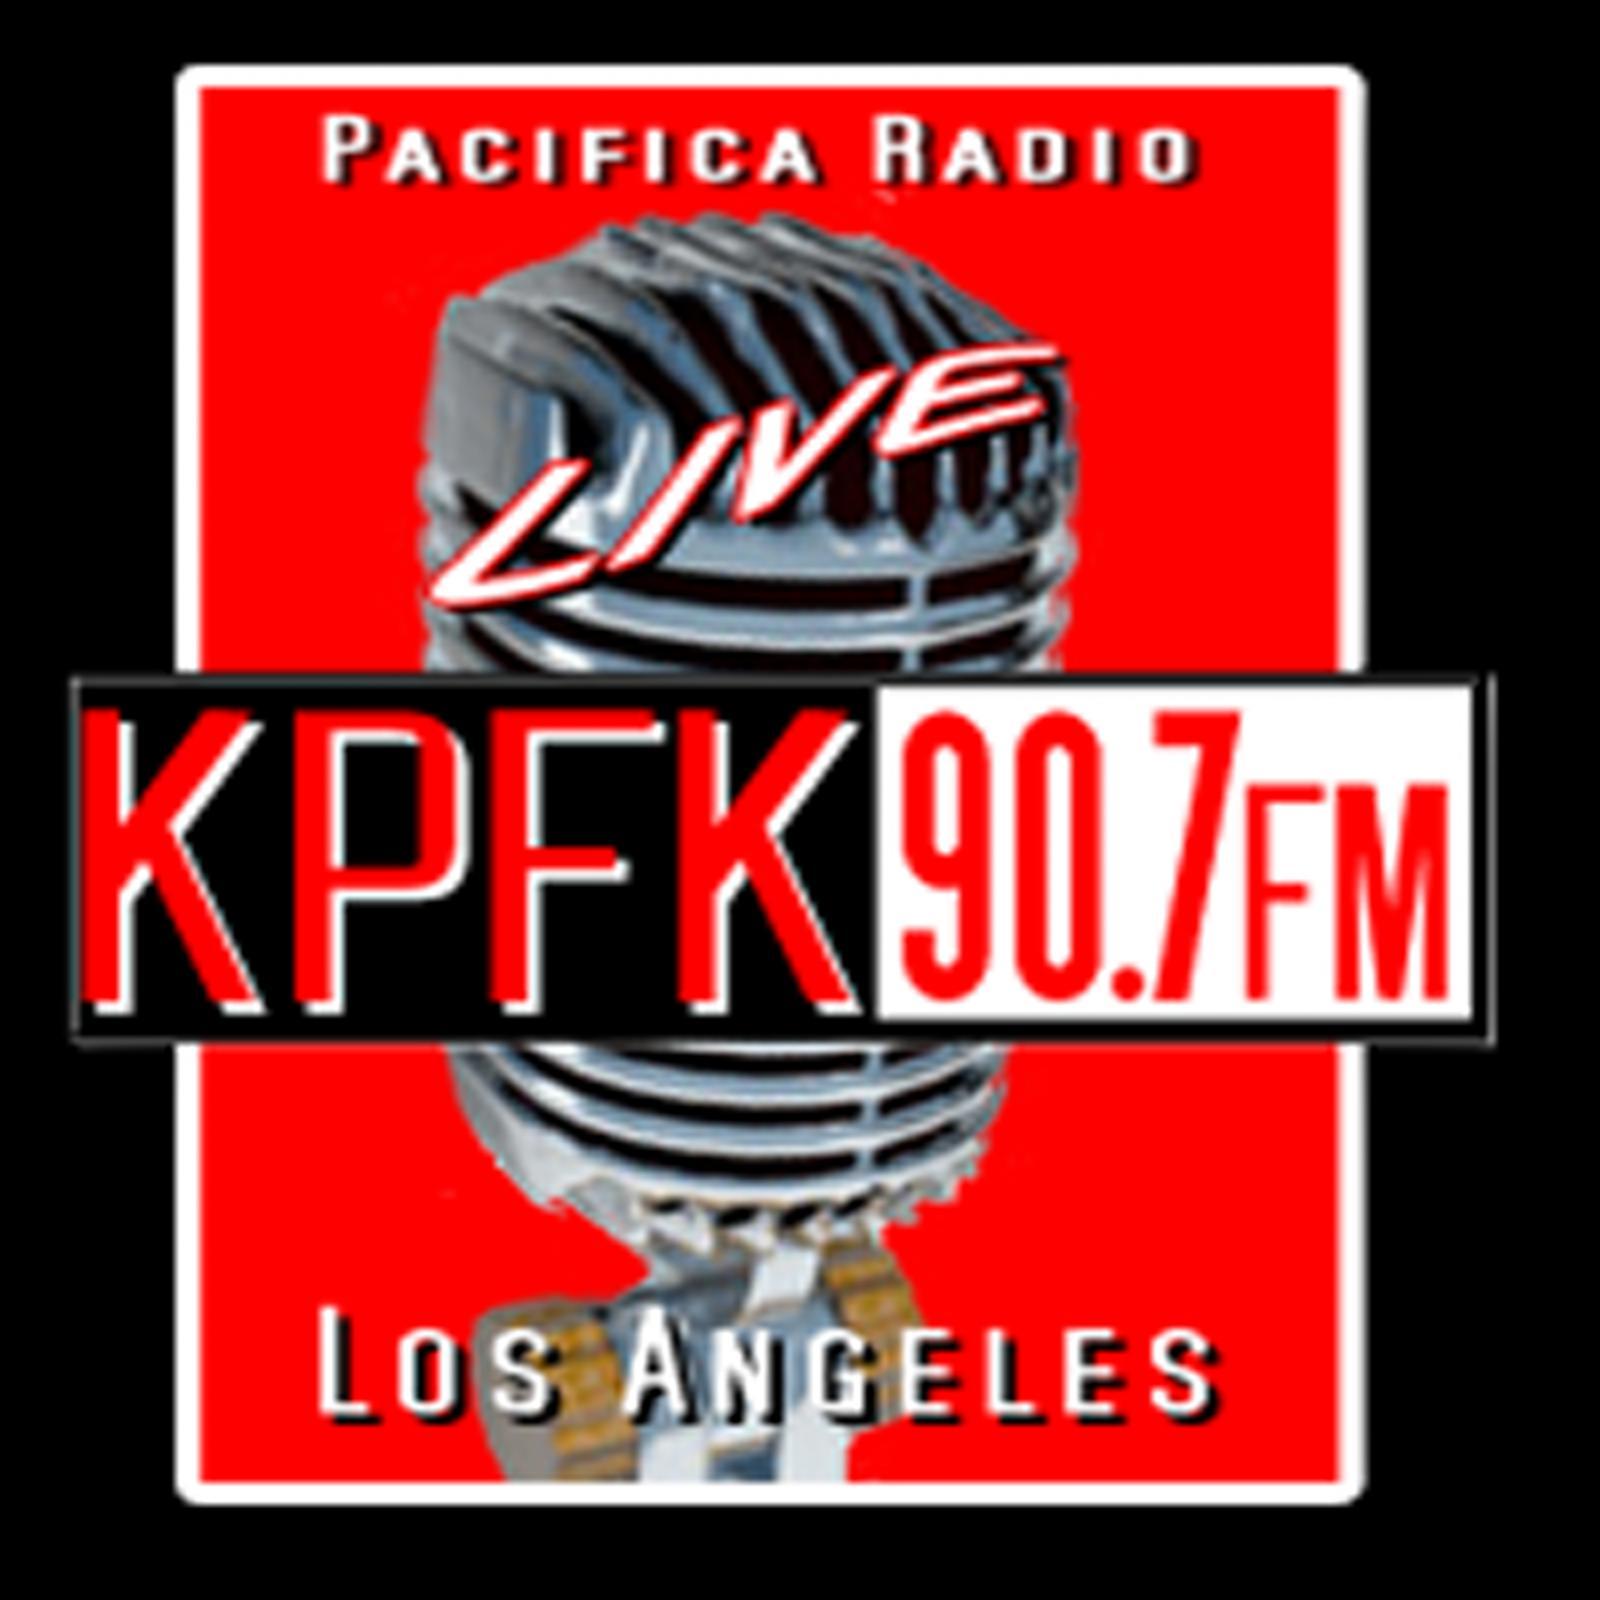 KPFK - Scholars Circle